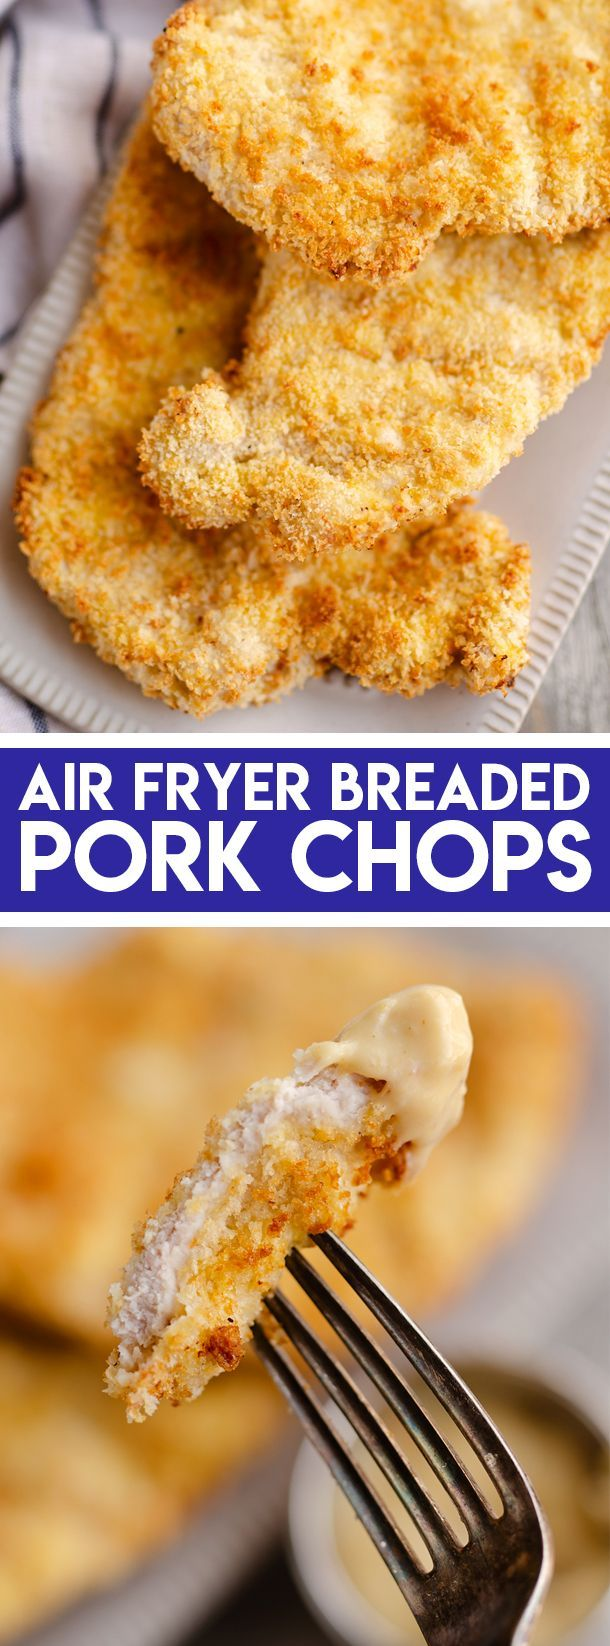 Crispy Air Fryer Breaded Pork Chops are crunchy on the